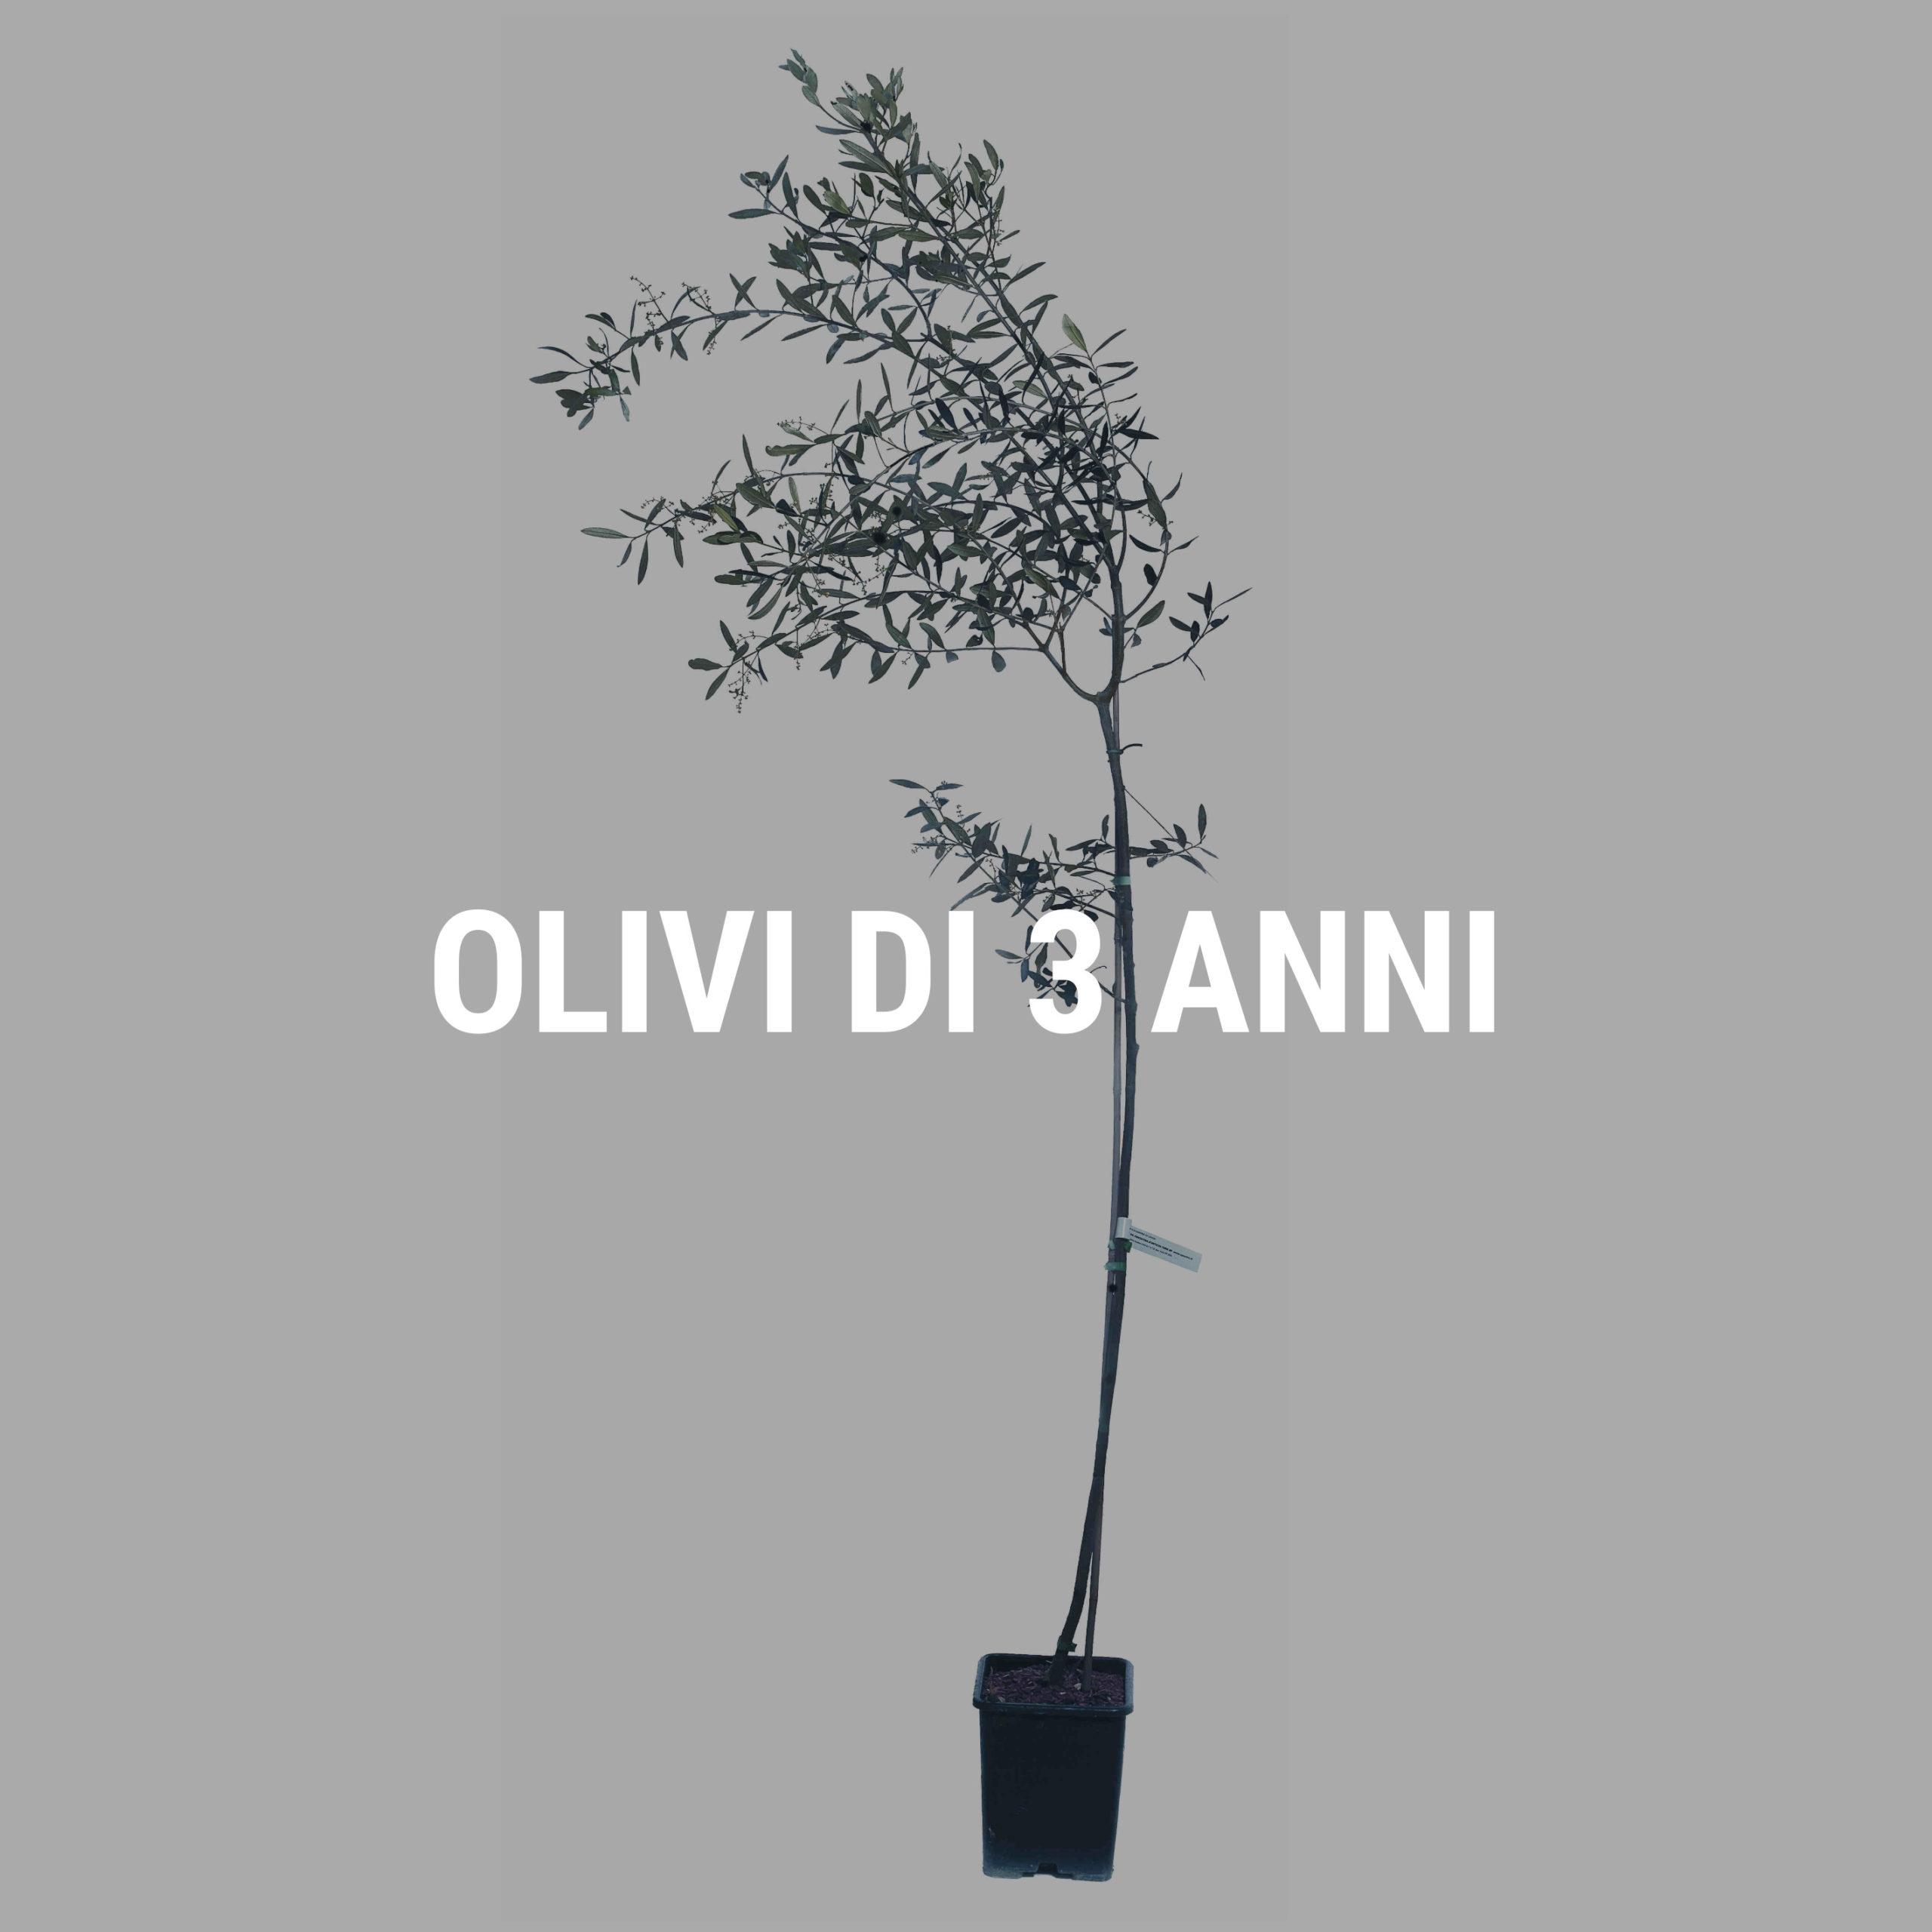 http://www.spoolivi.com/wp-content/uploads/2021/03/olivi_3_anni-2-scaled.jpg